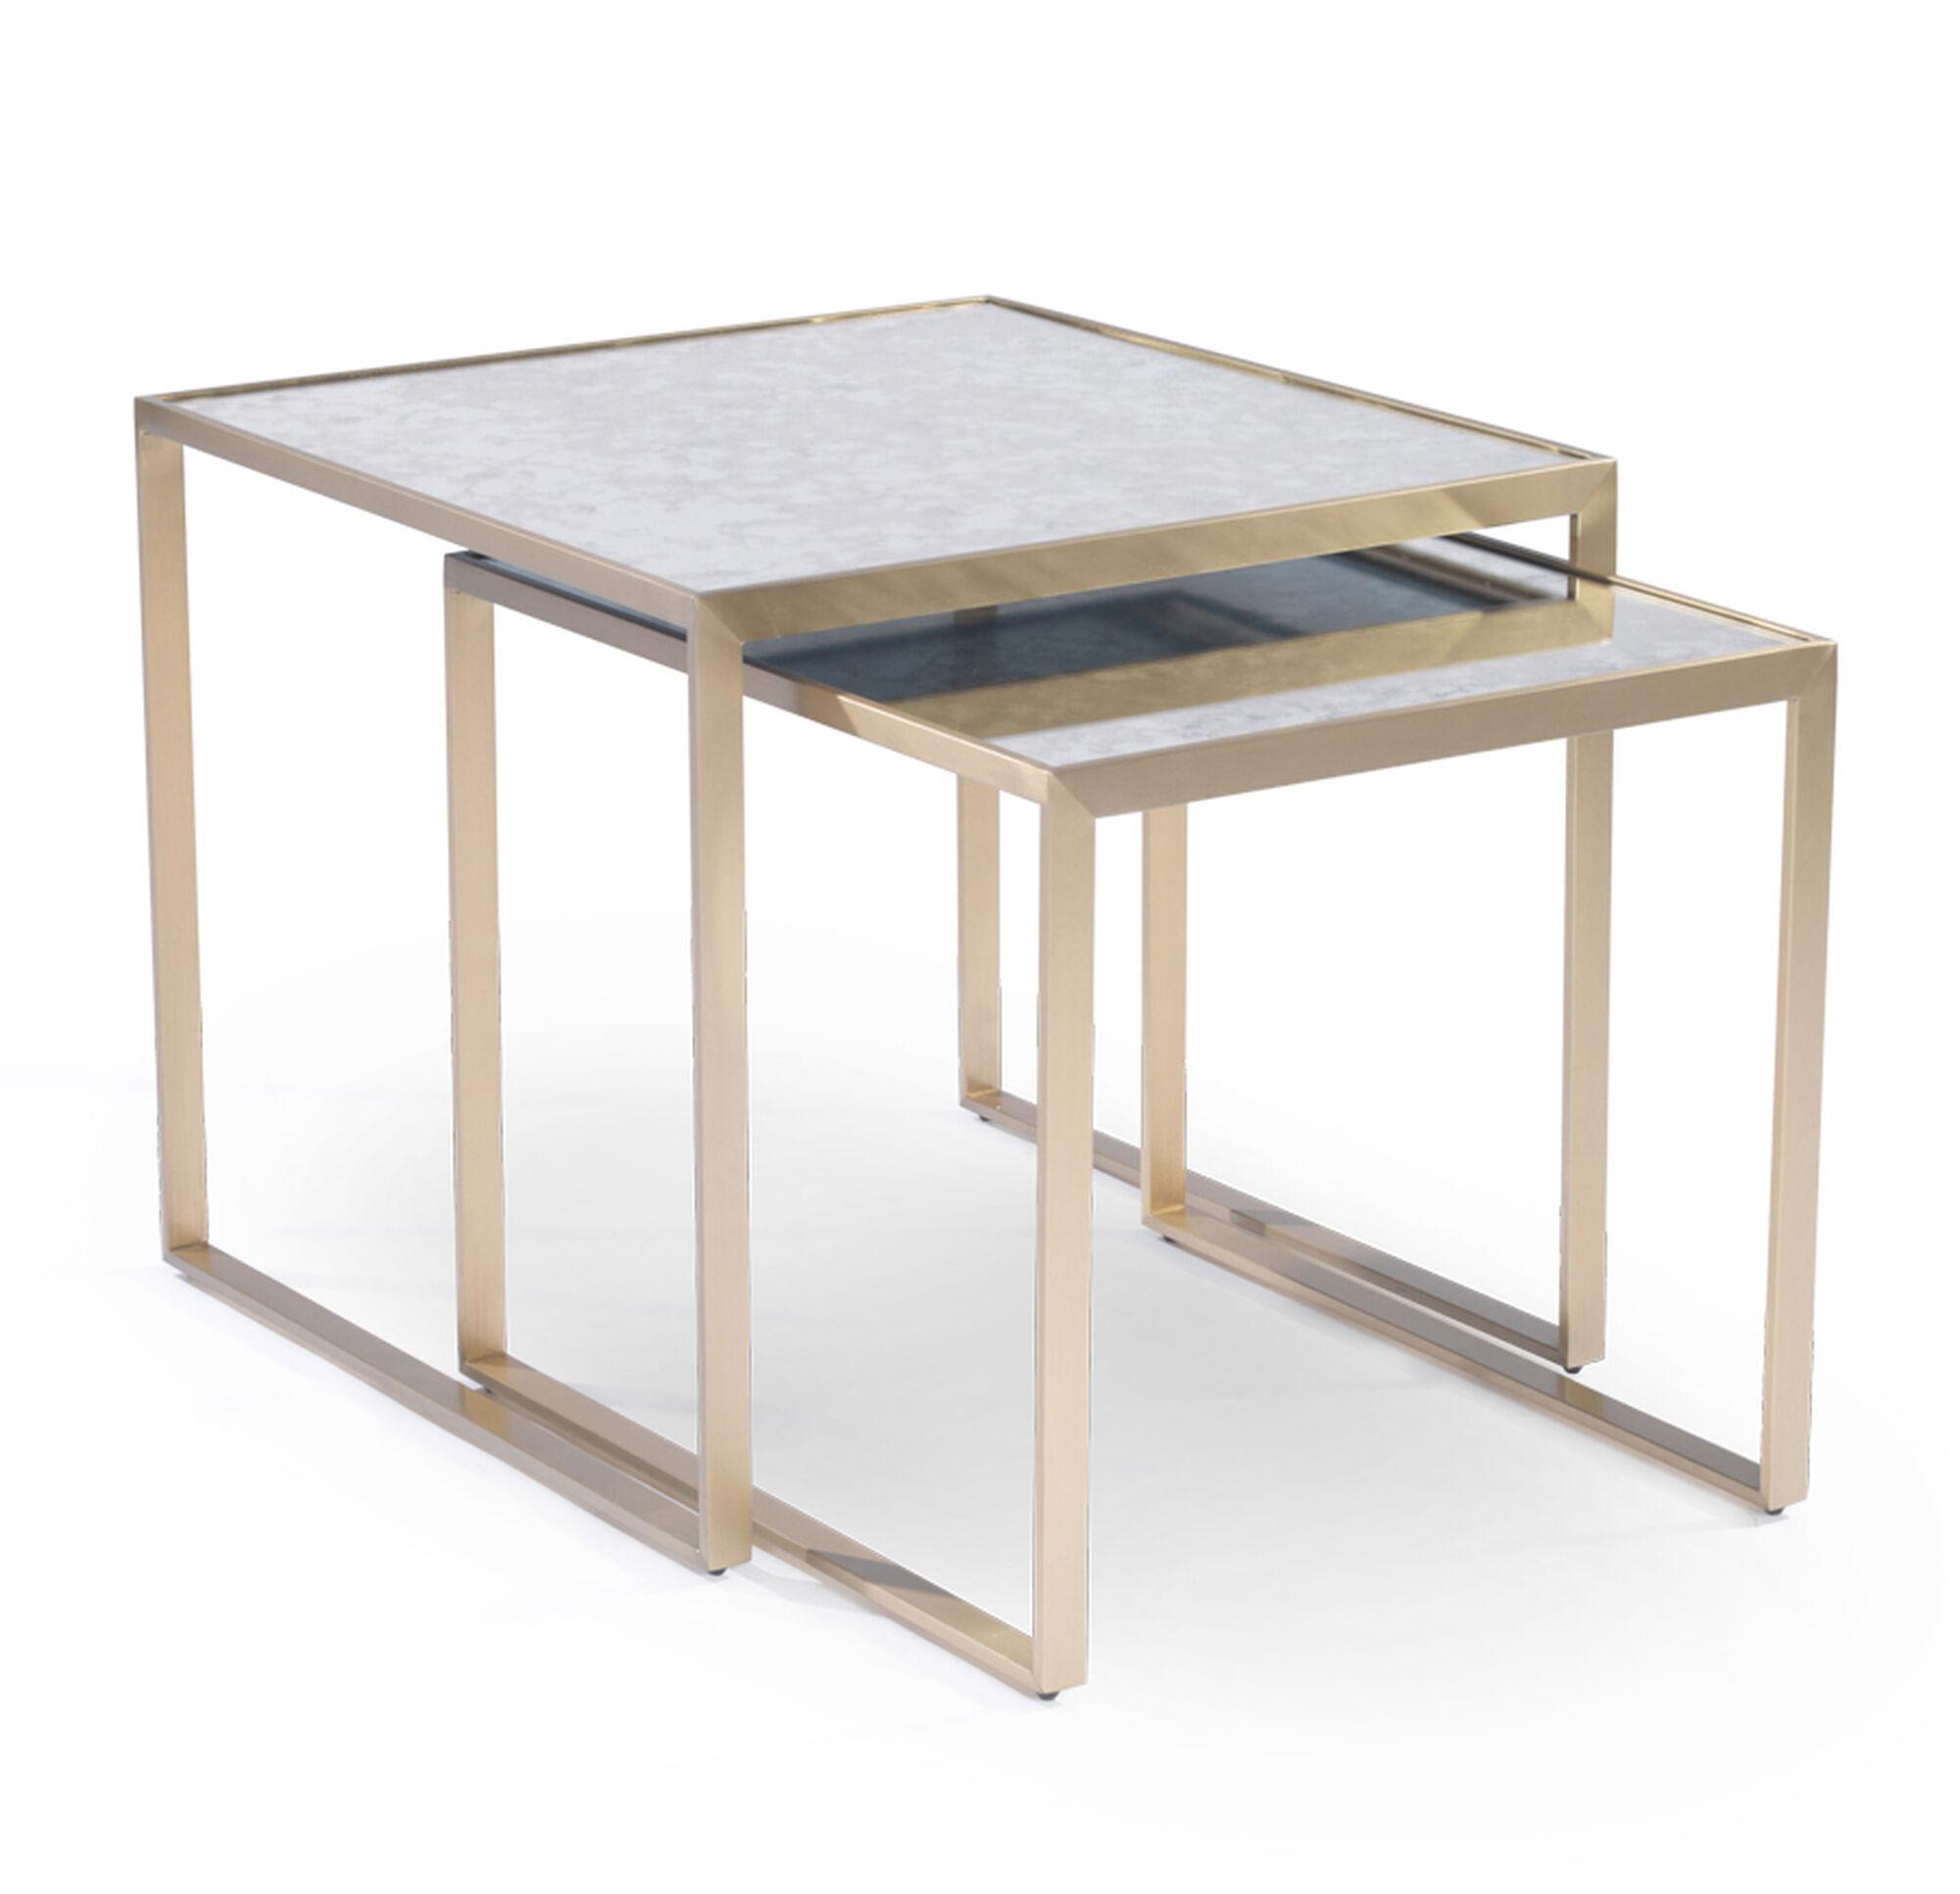 nesting end tables. ASTOR NESTING SIDE TABLE - BRASS, , Hi-res Nesting End Tables